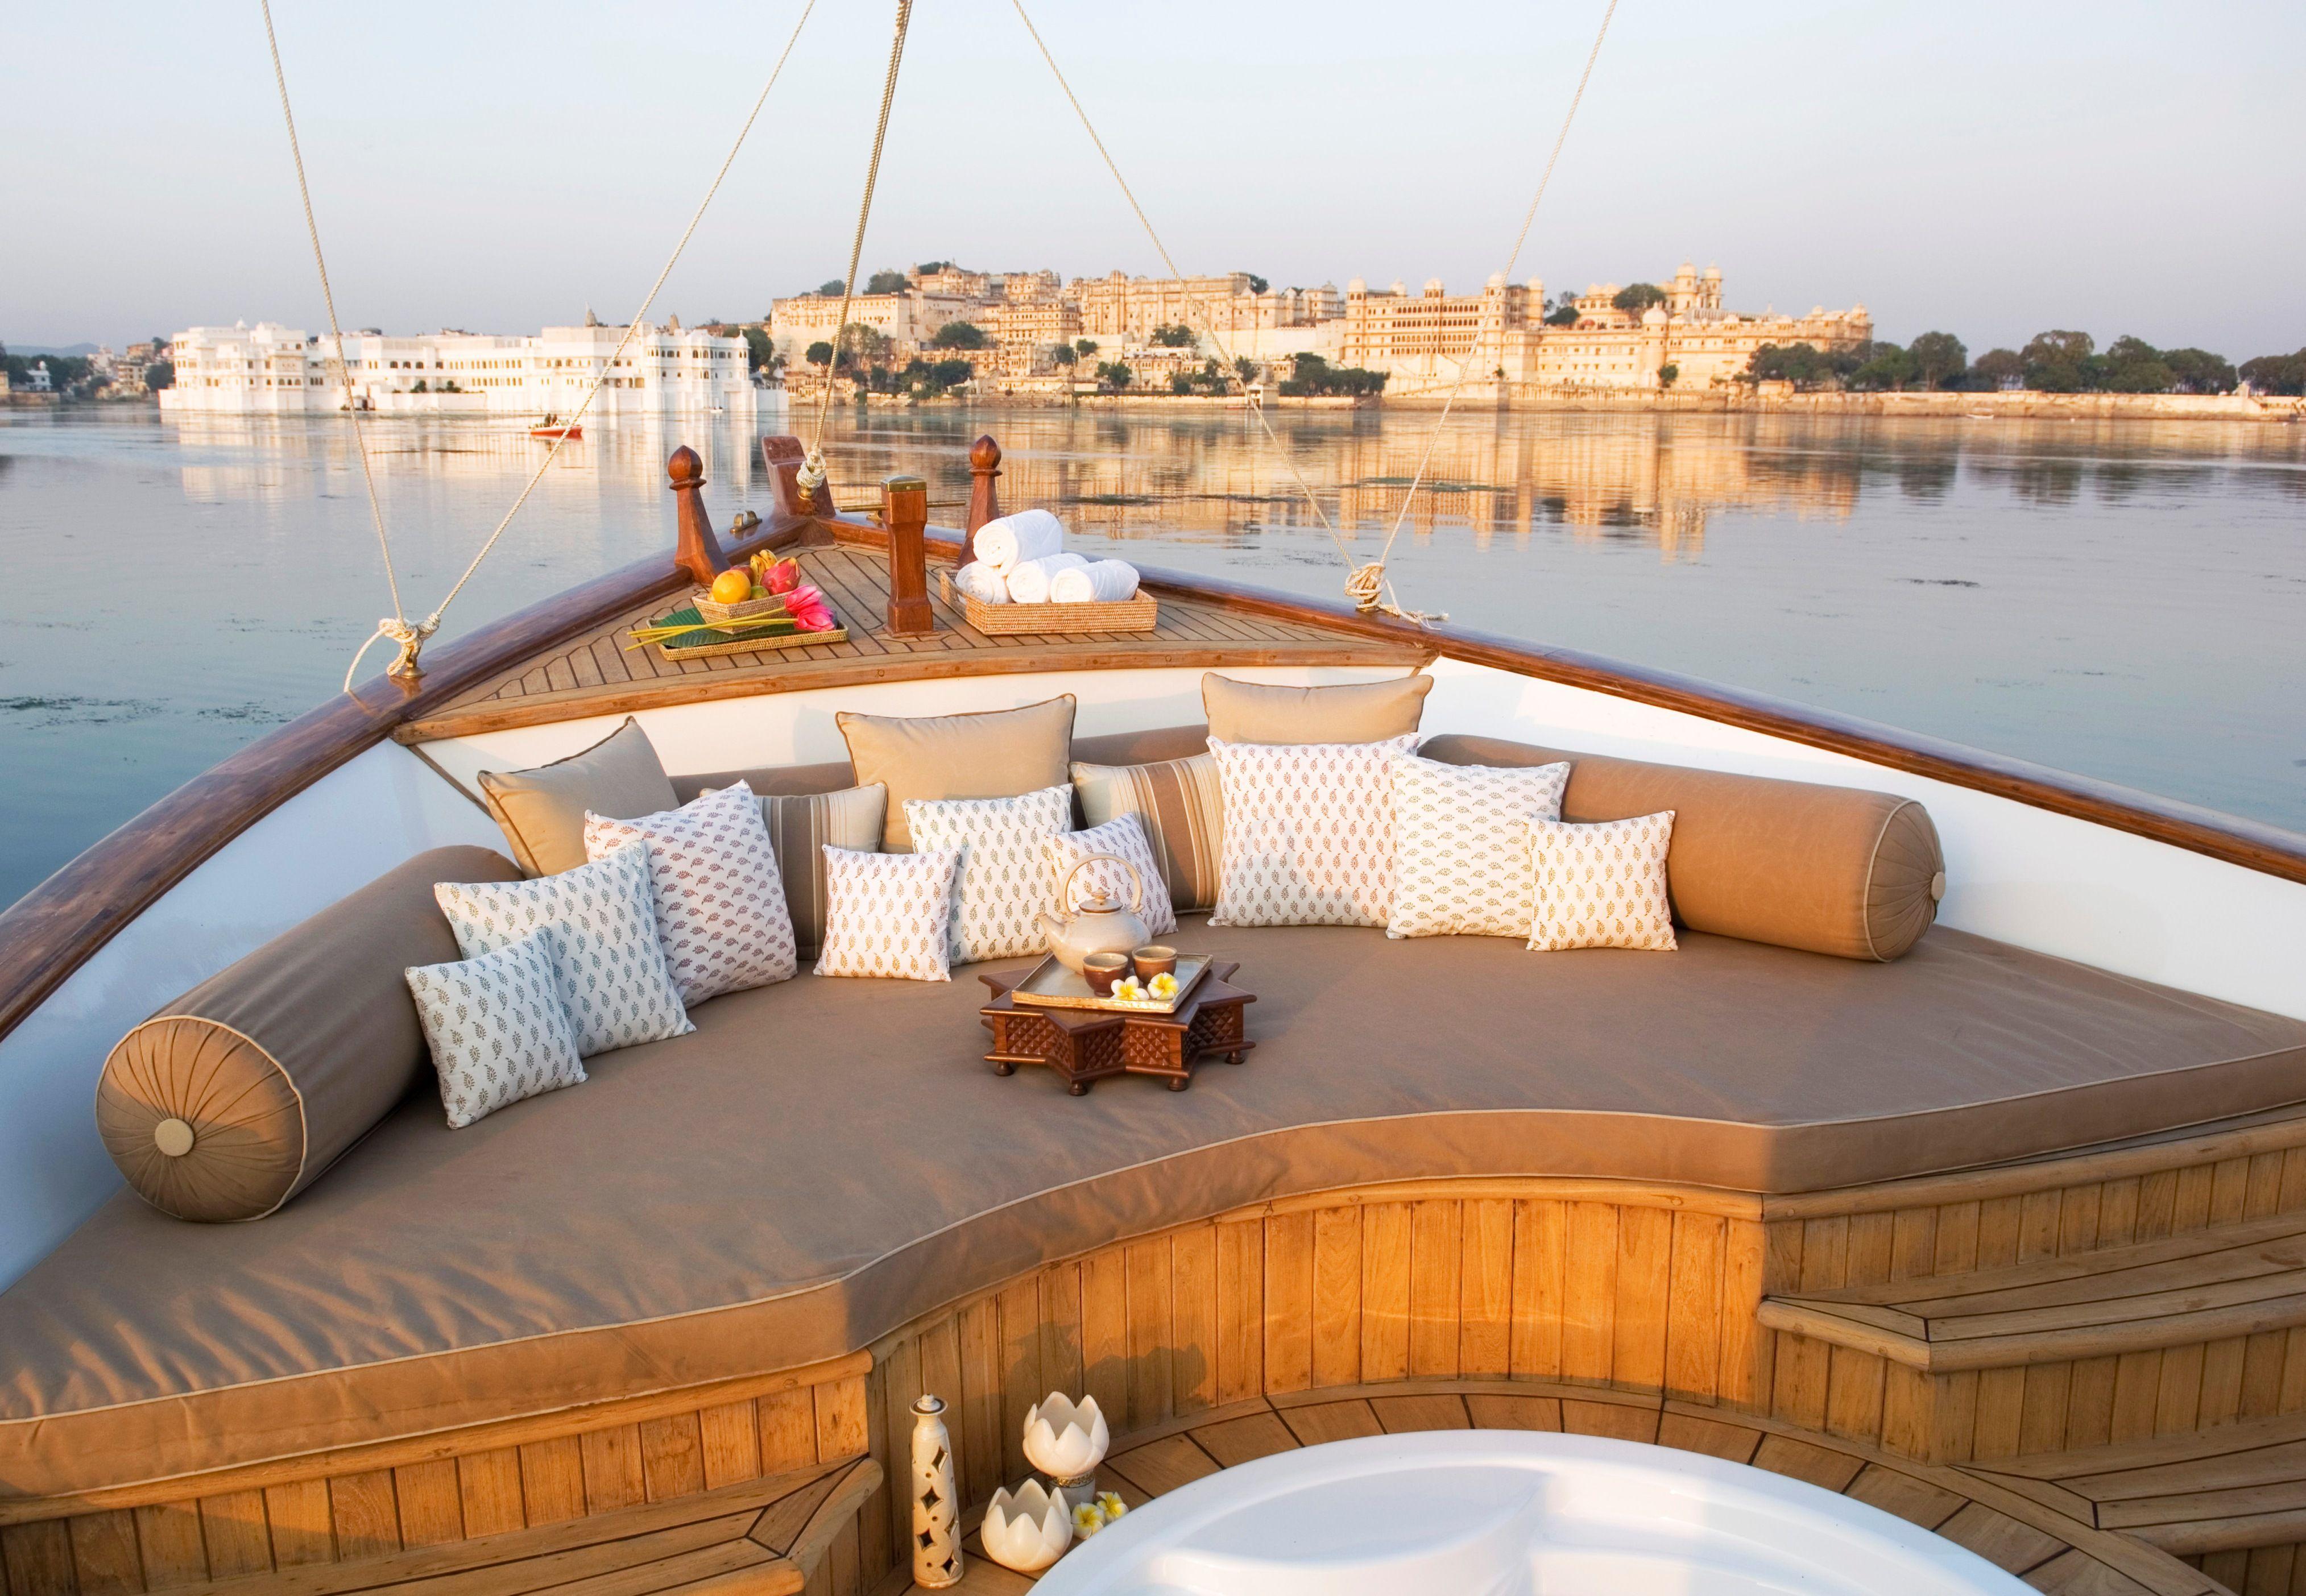 Spa Boat, Taj Lake Palace, Udaipur, North India Perfect